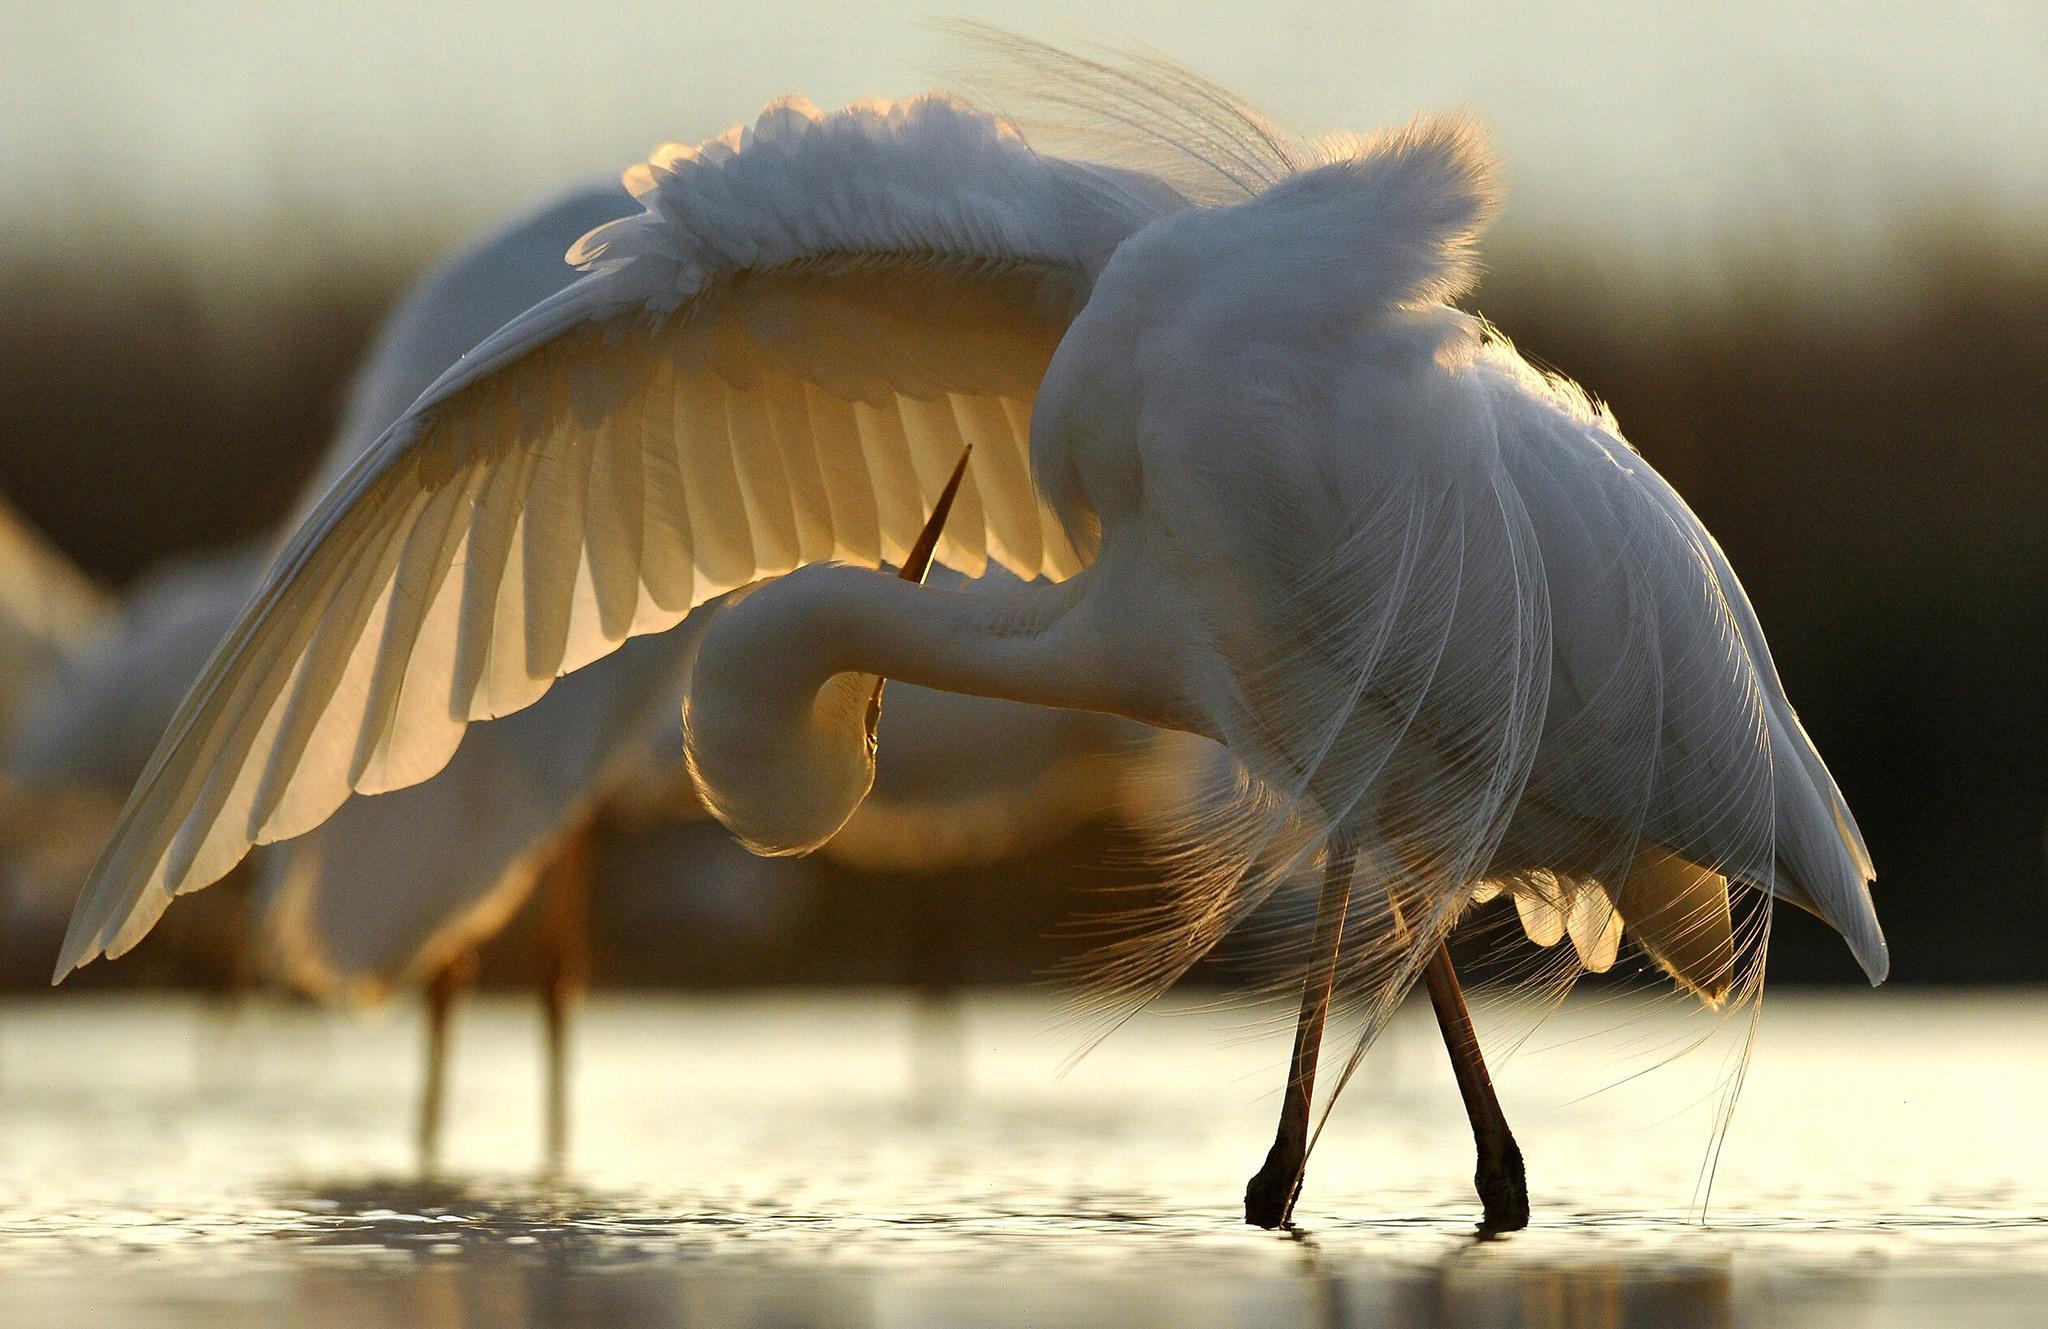 A grey egret preens itself near Pusztaszer, southeast of Budapest, Hungary